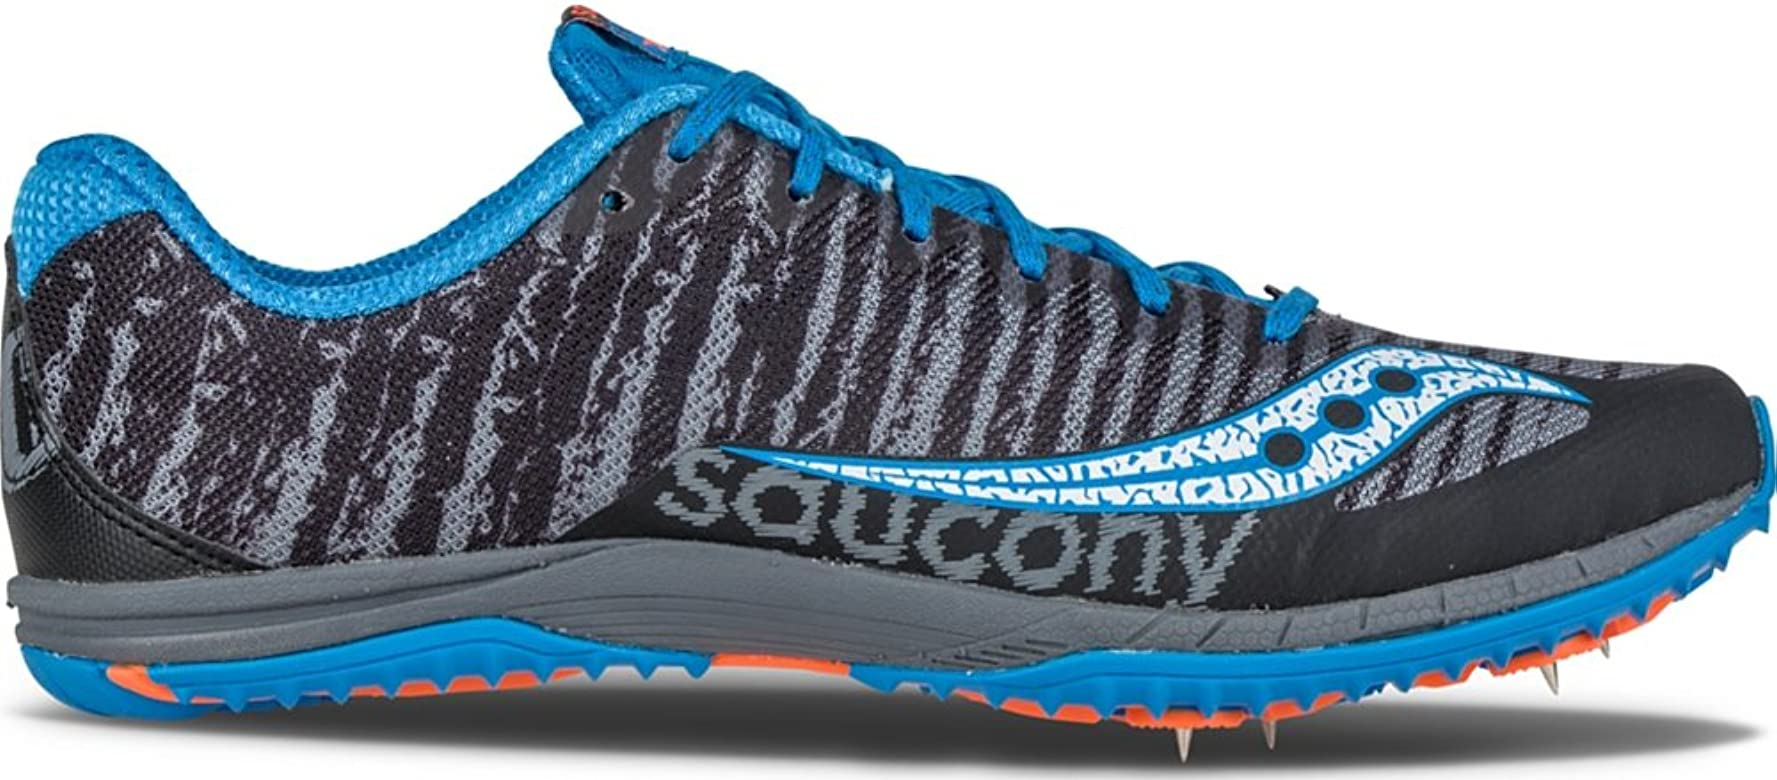 77f7b6e4 Men's Kilkenny XC5 Cross-Country Shoe